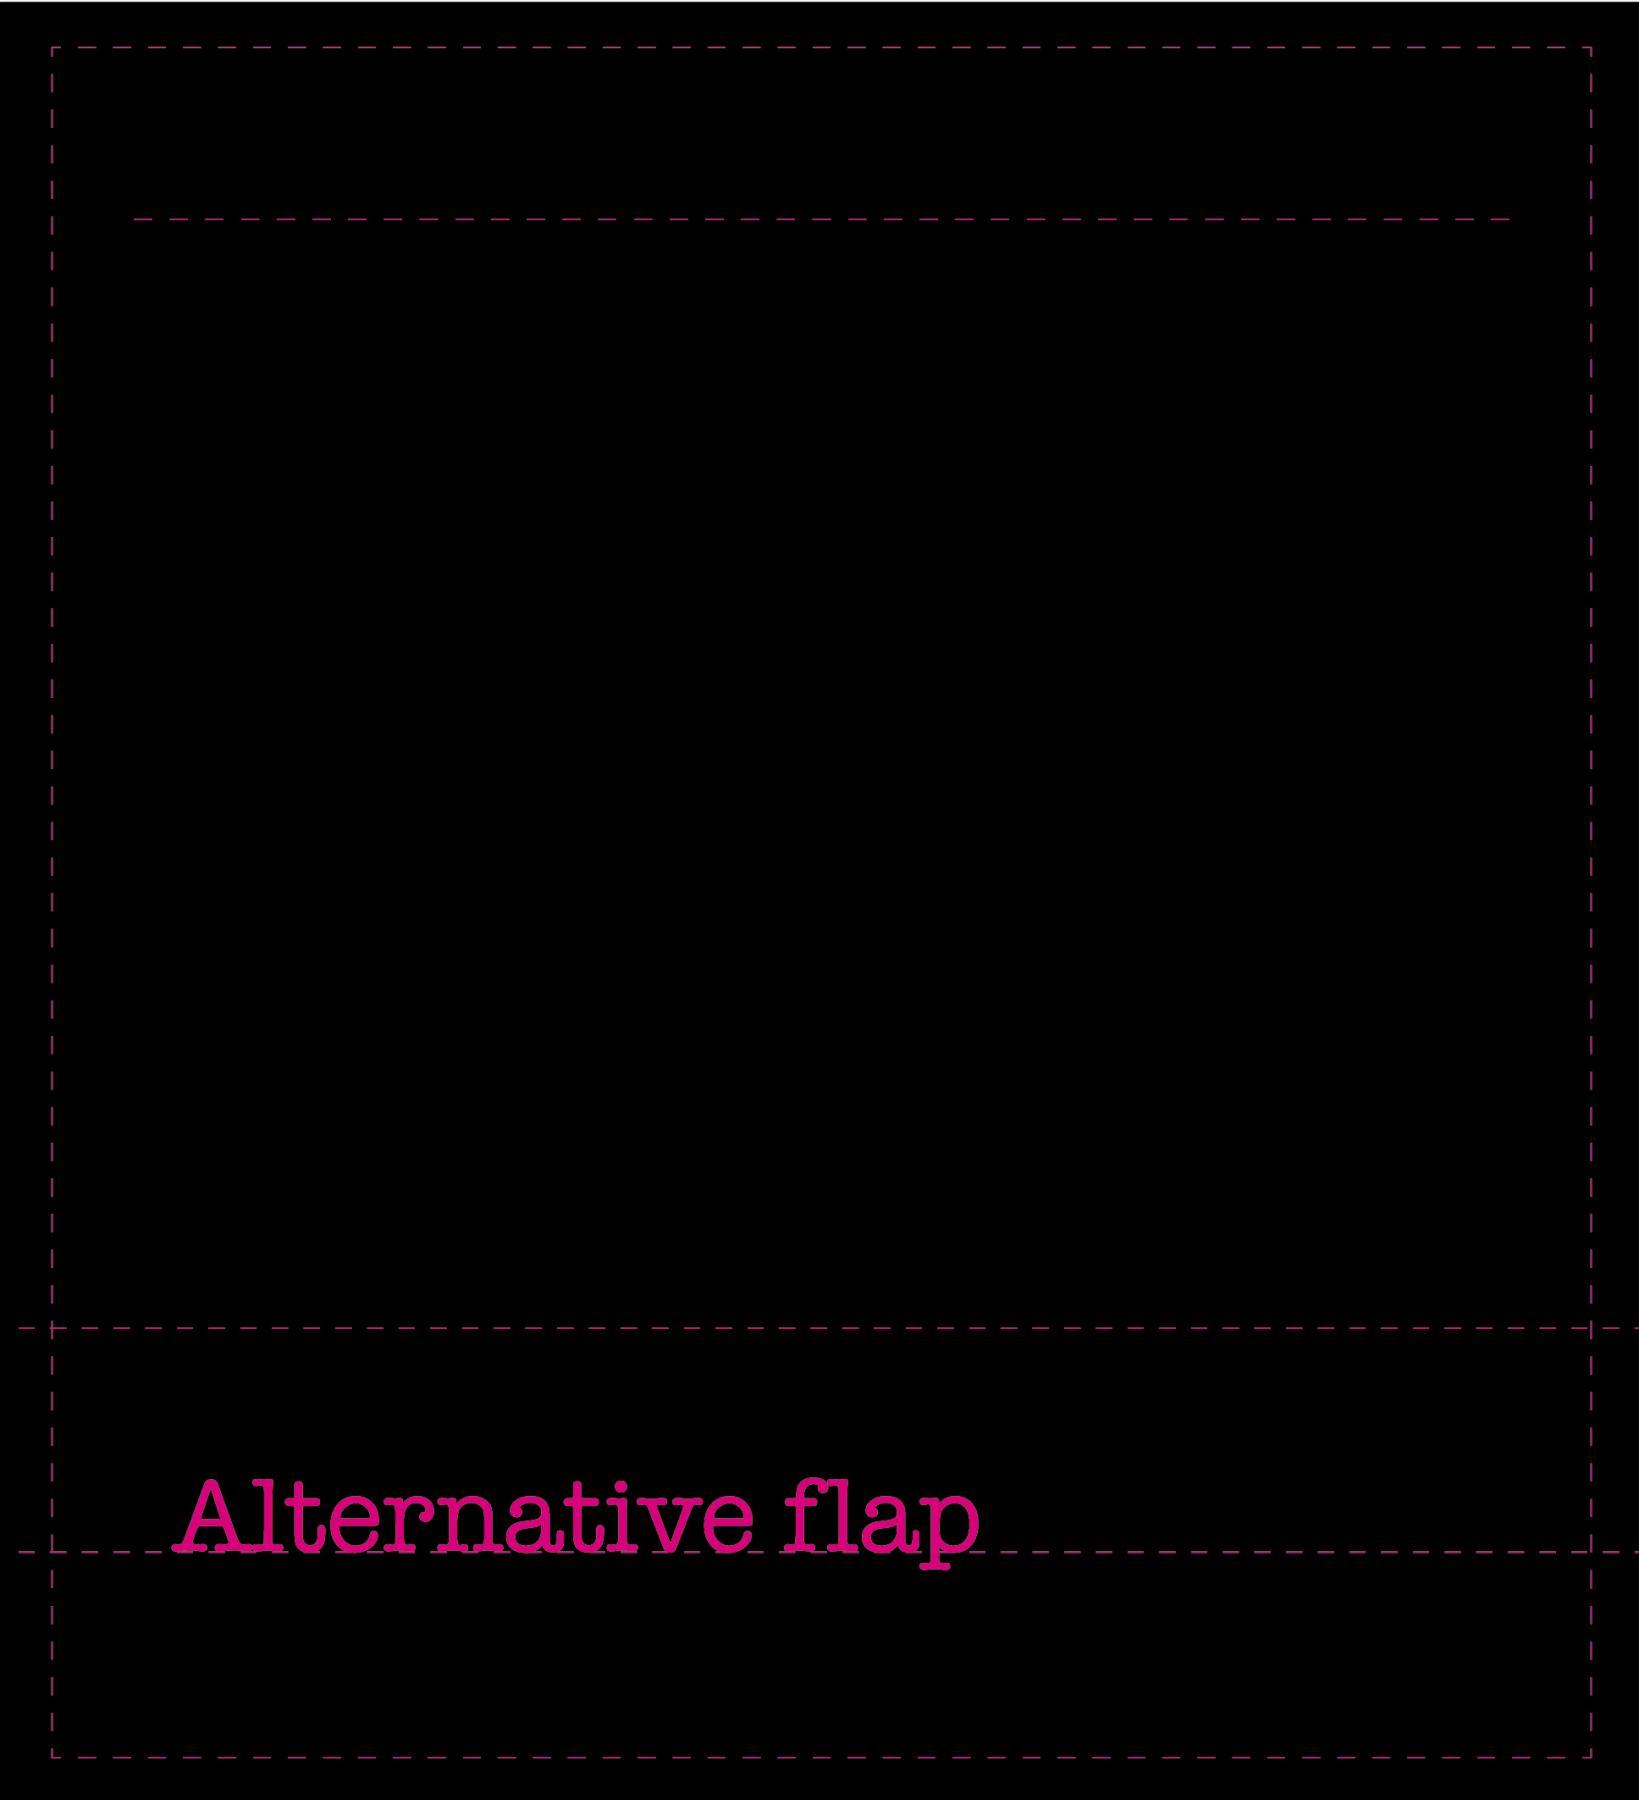 Alternative flap (mittel)